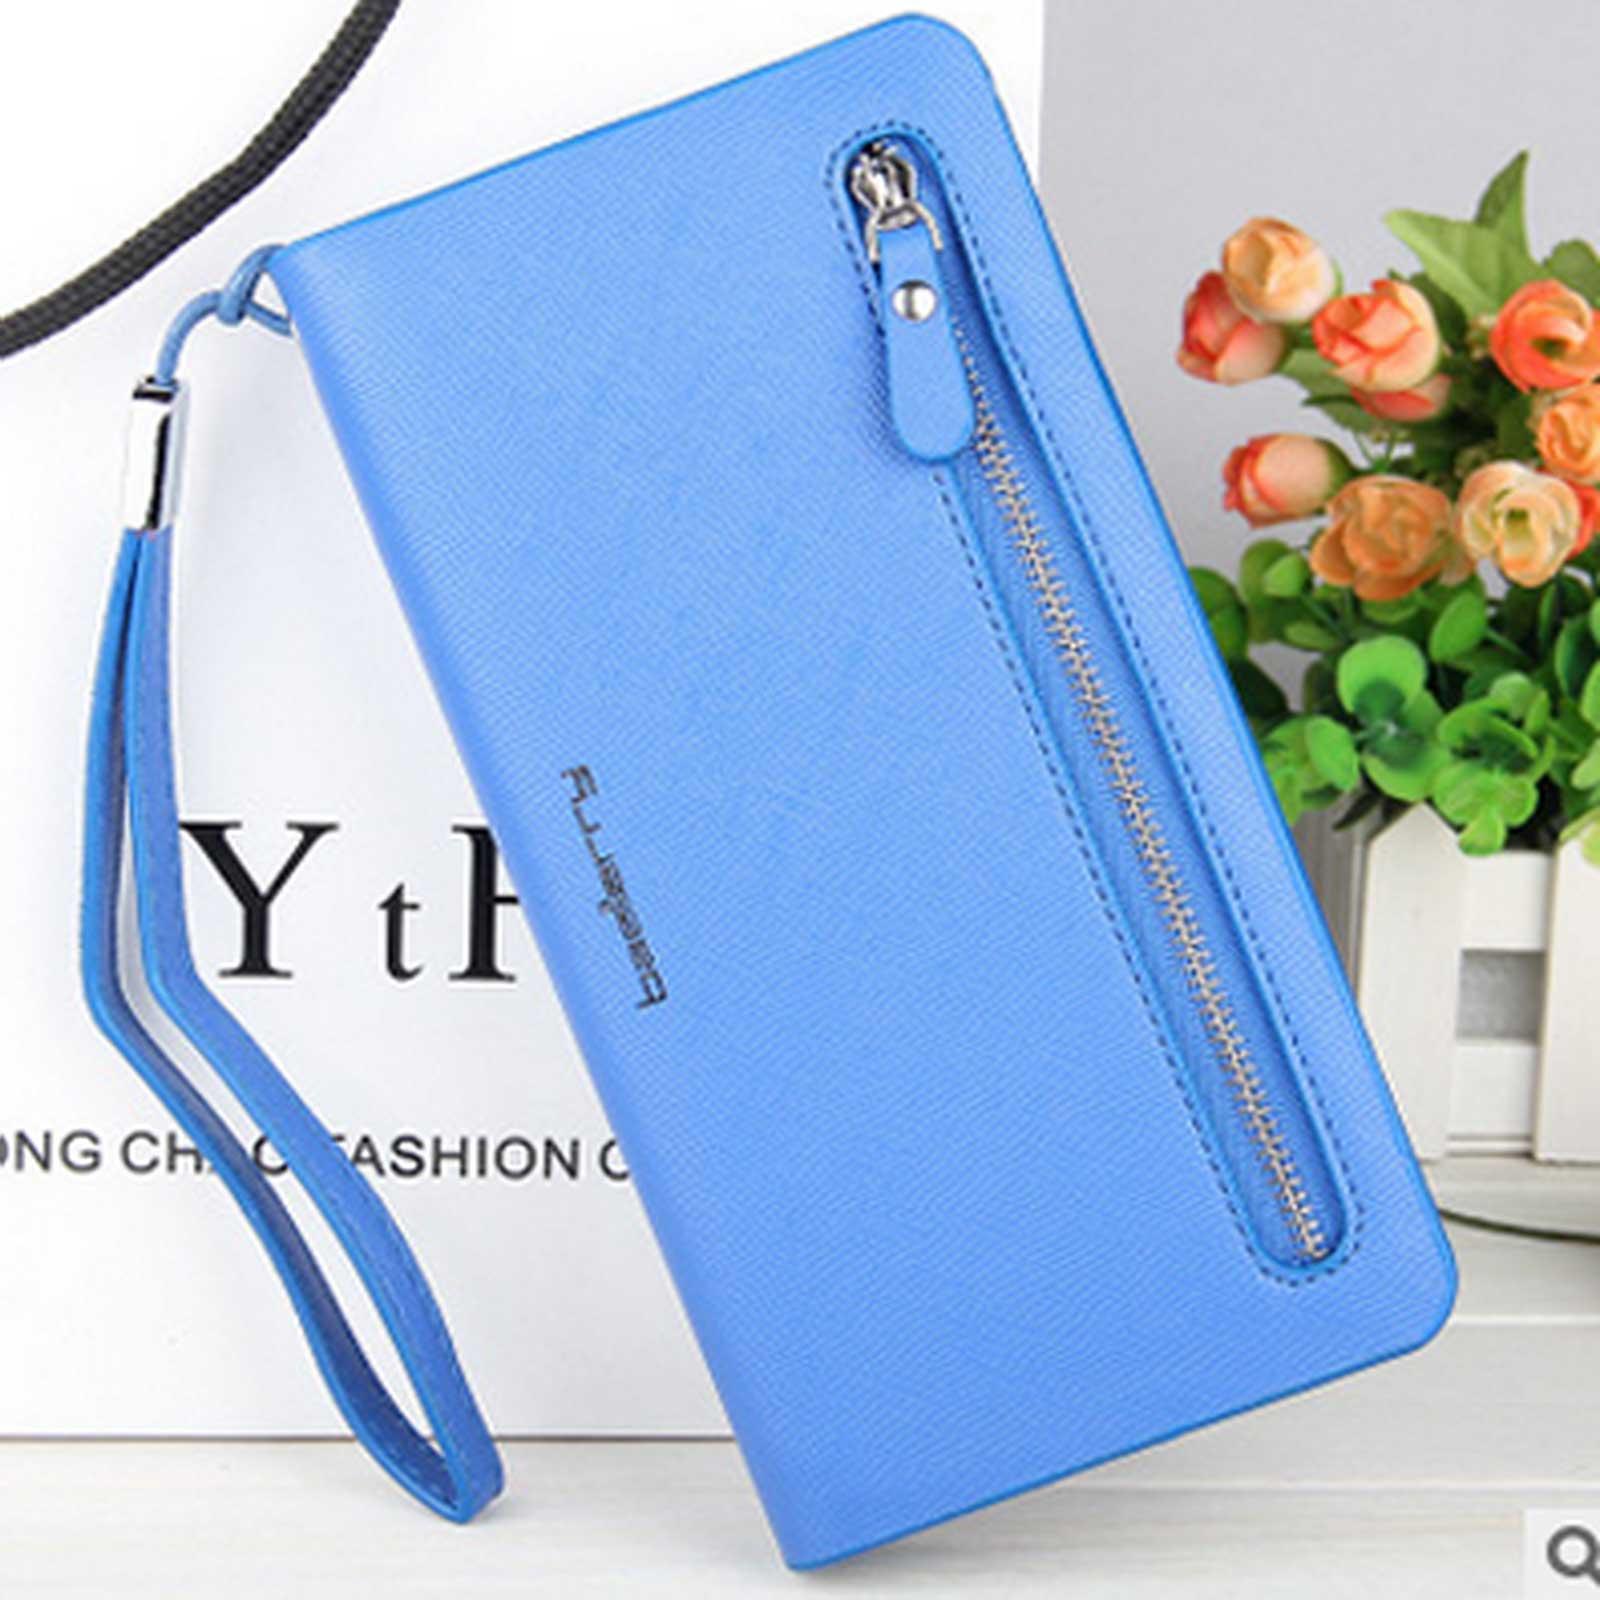 Lady-039-s-Three-Folds-Leather-Korean-Medium-Style-Zipper-Large-Capacity-Wallet